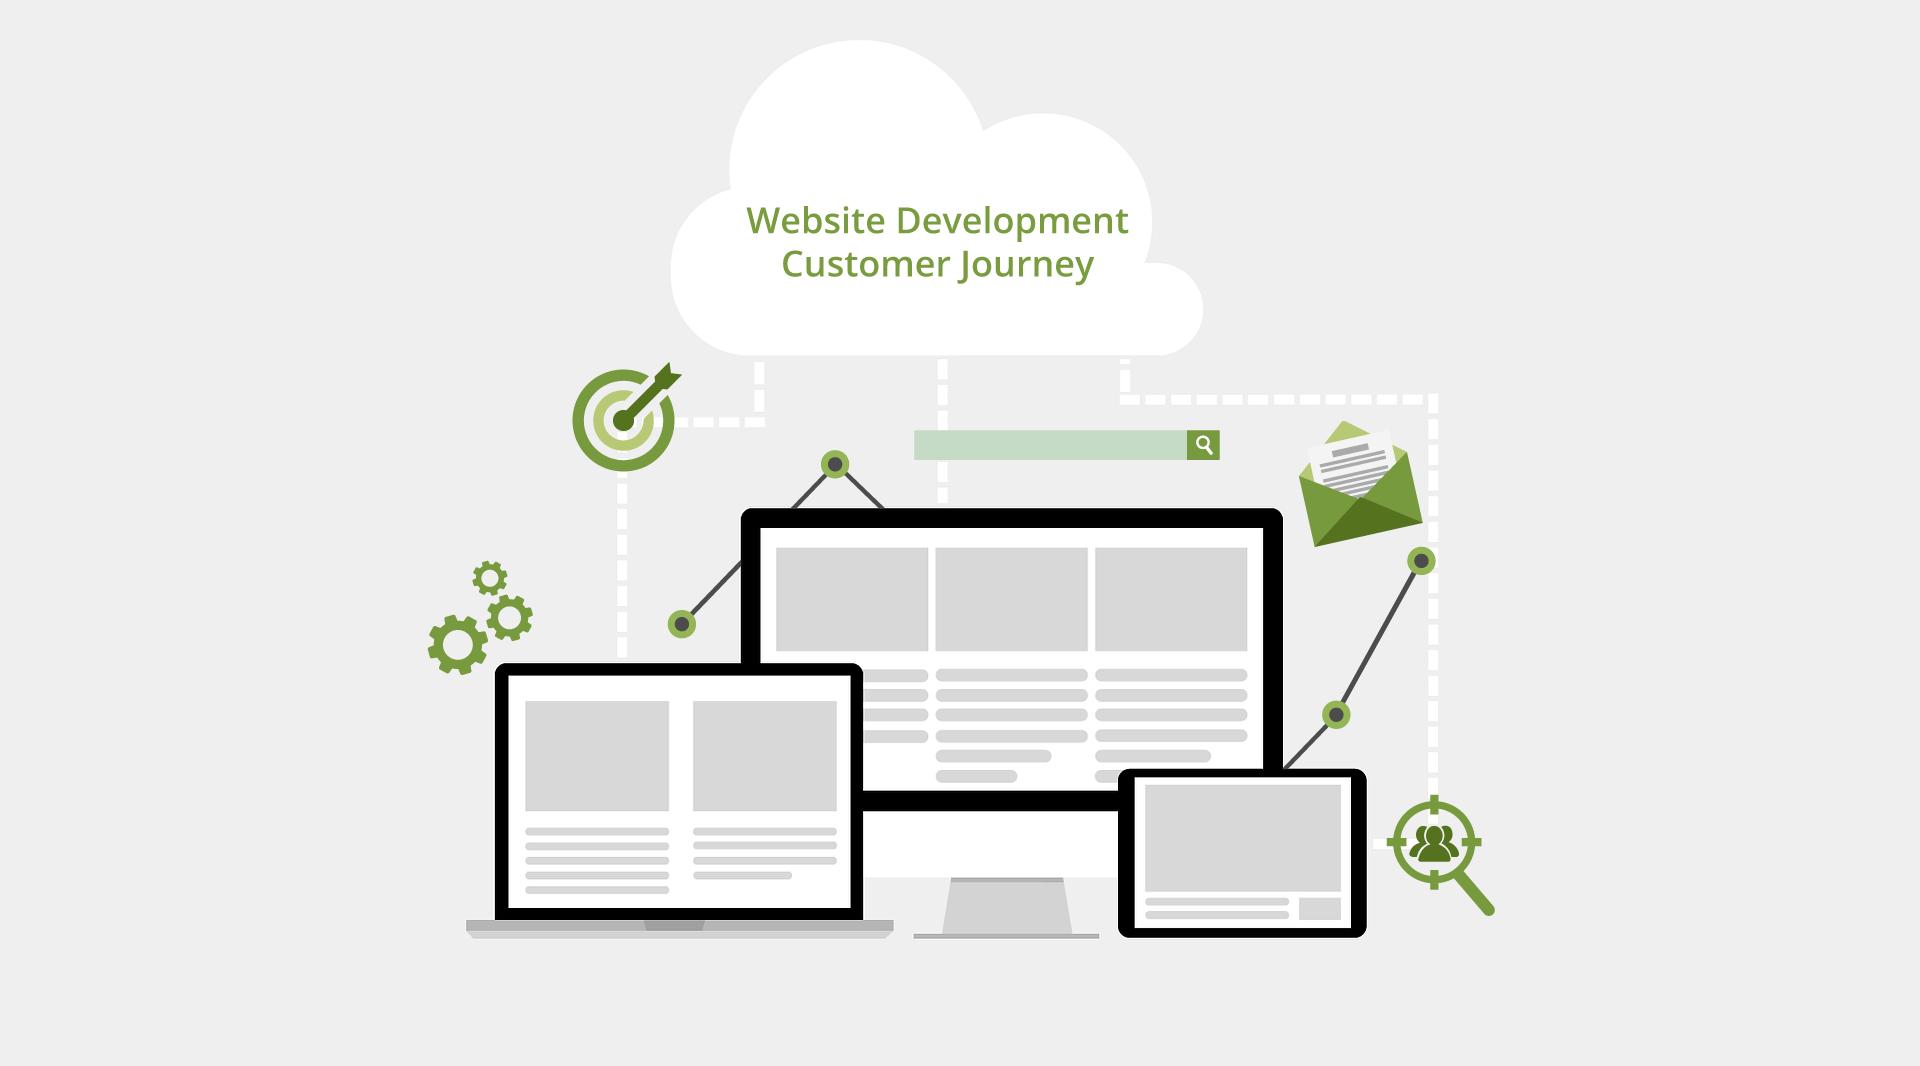 Web Development Archives - Oxidian GmbH